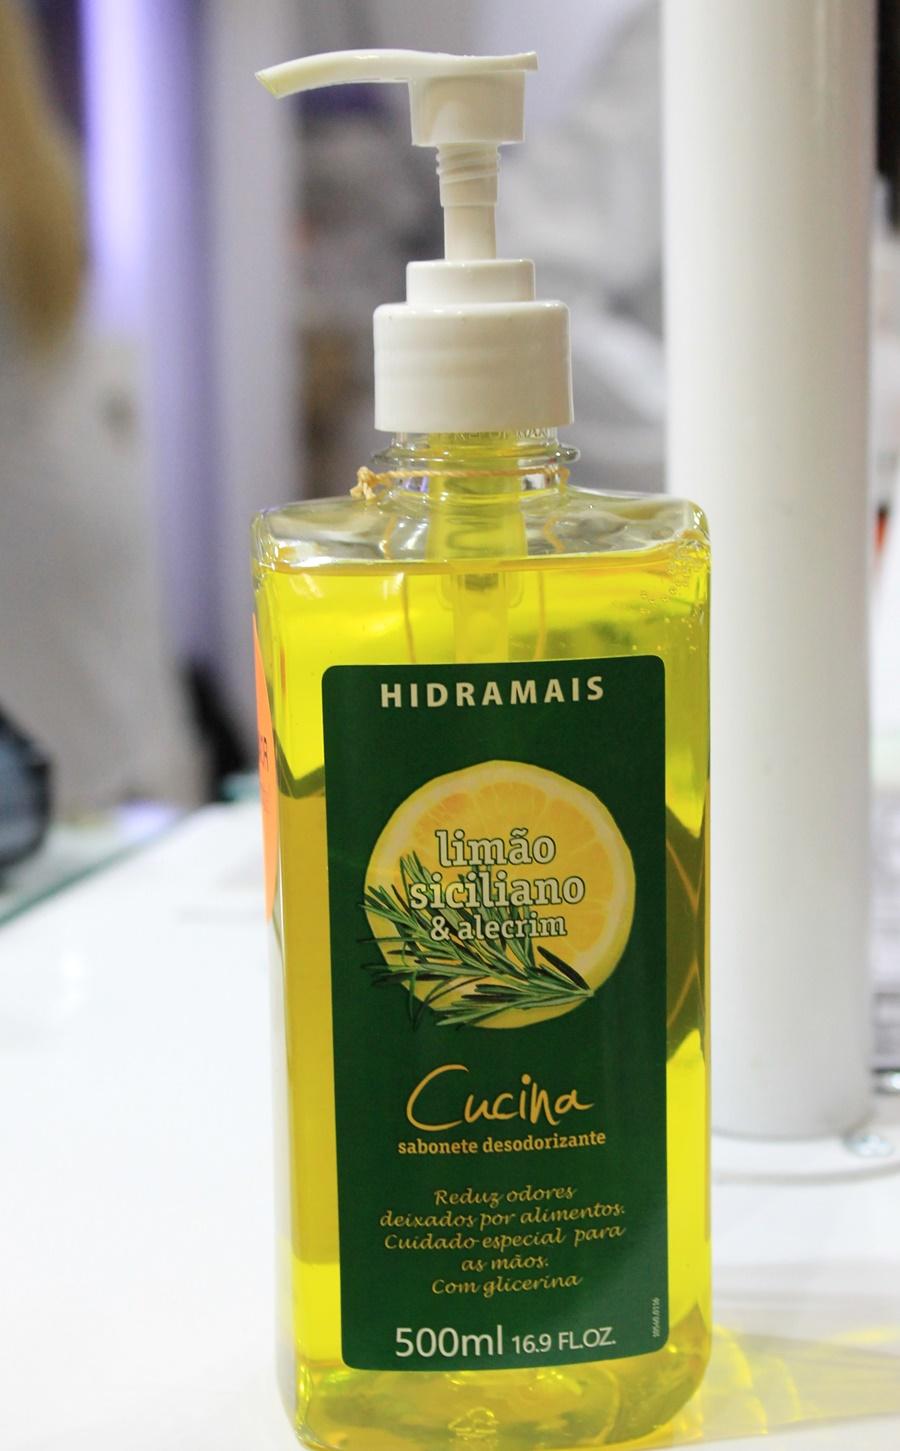 sabonete desodorizante cucina hidramais